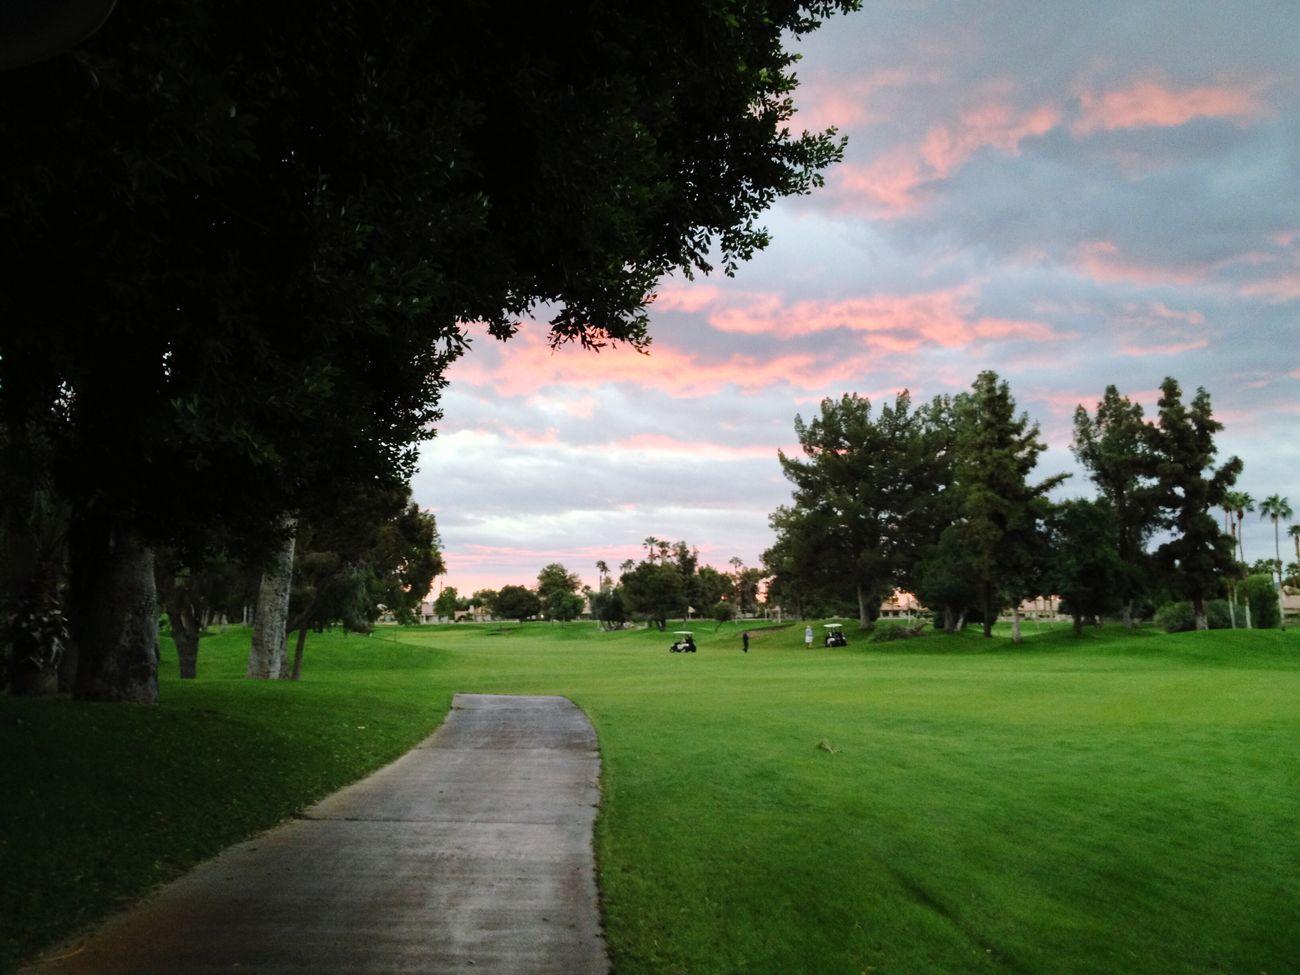 Tee Time Golfing Sunrise Palm Springs Cart Path Fairway